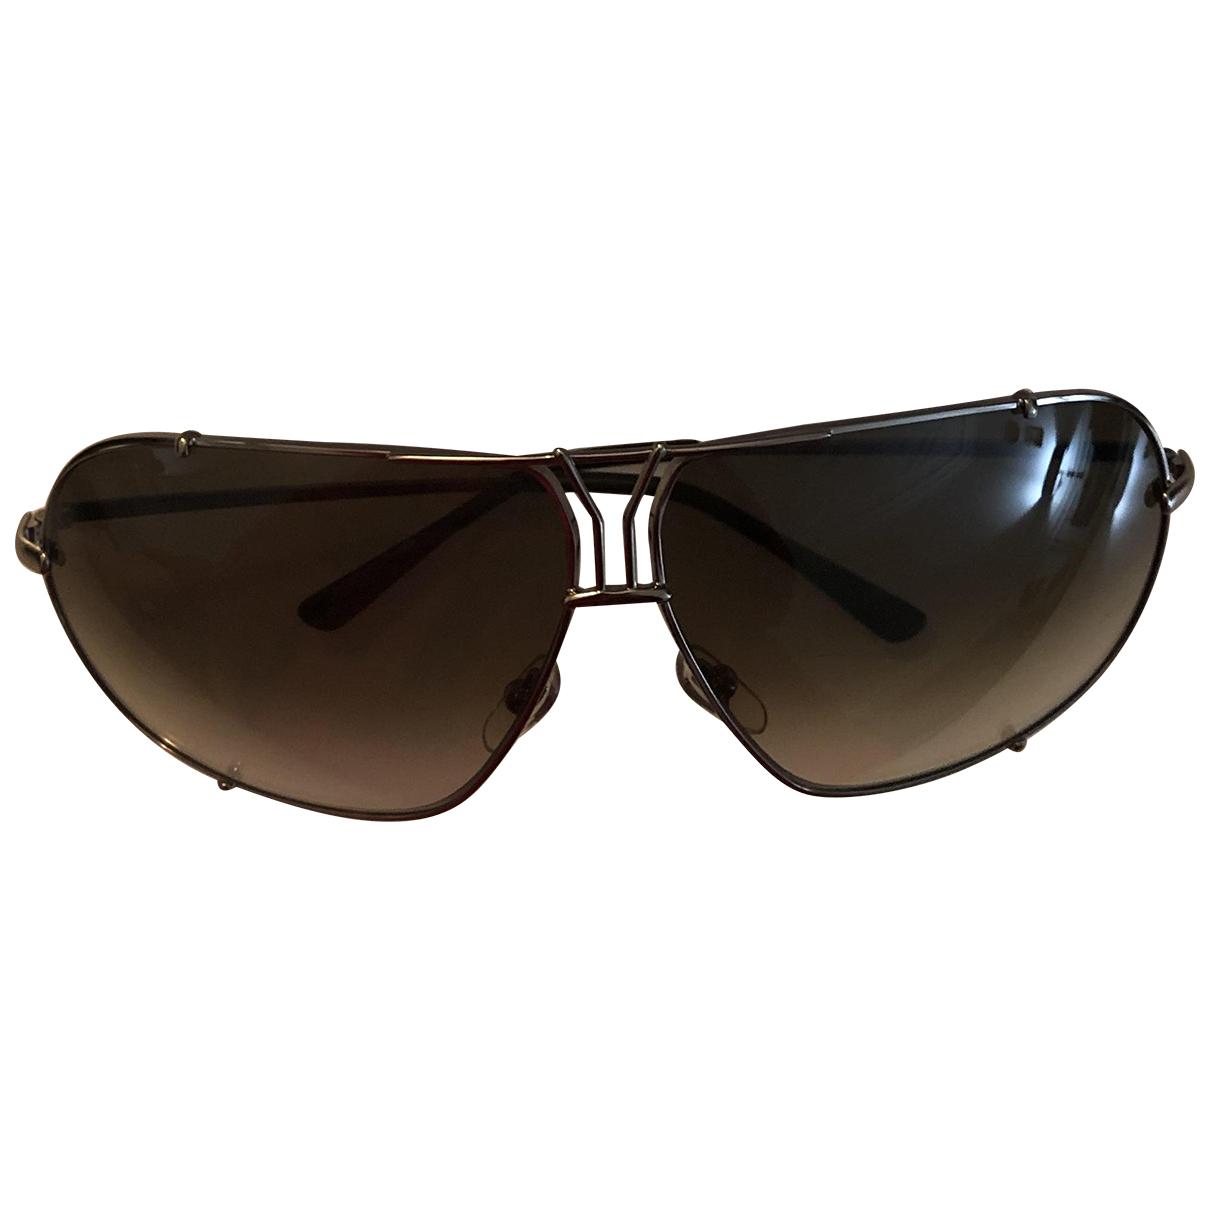 Yves Saint Laurent N Anthracite Metal Sunglasses for Women N